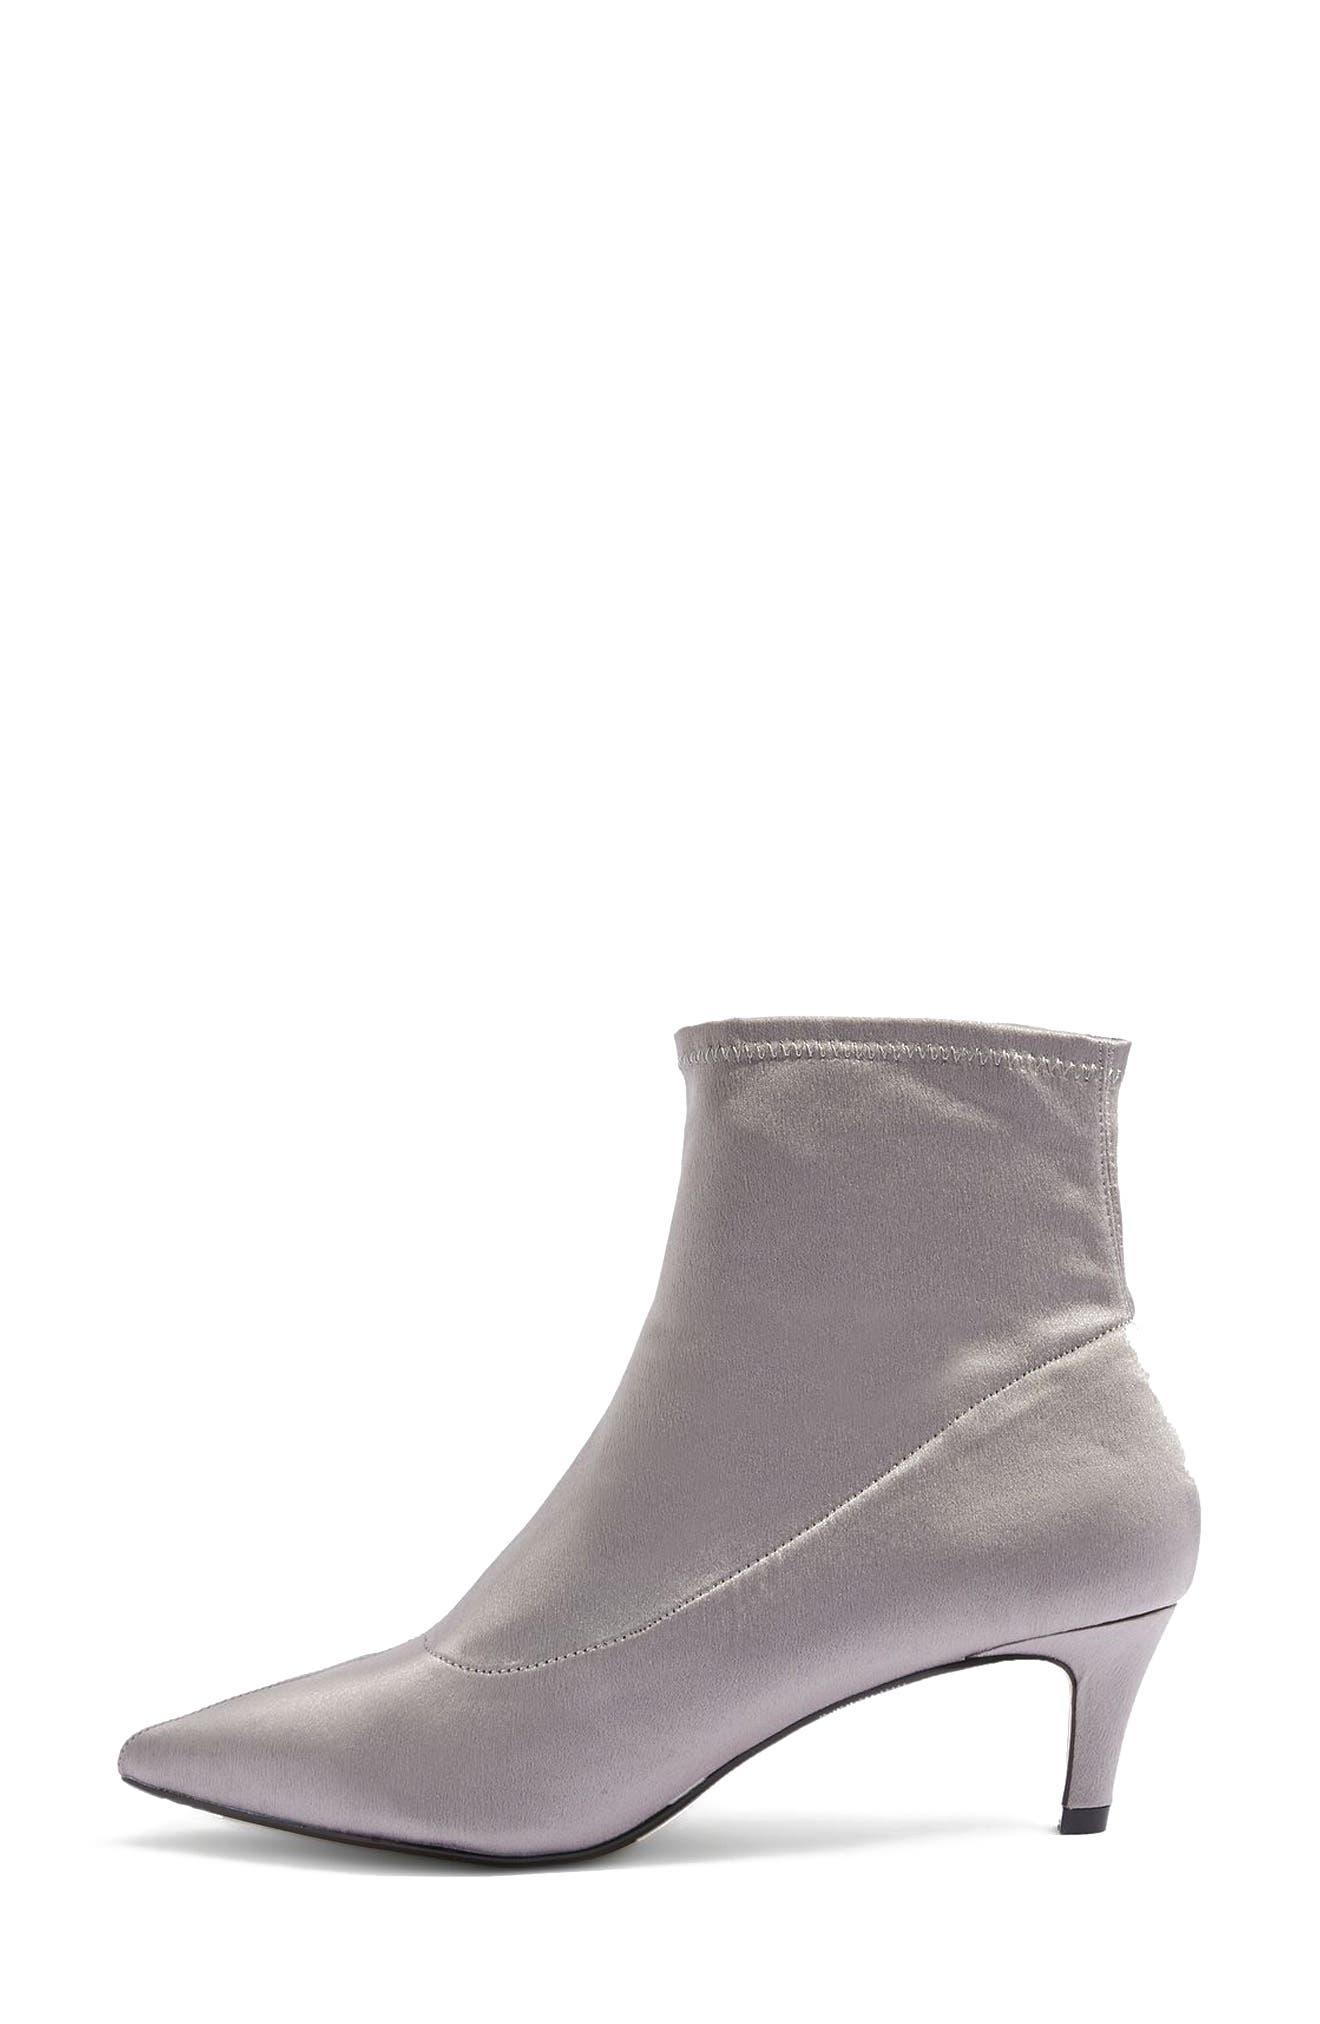 Bon Bon Satin Sock Bootie,                             Alternate thumbnail 2, color,                             Grey